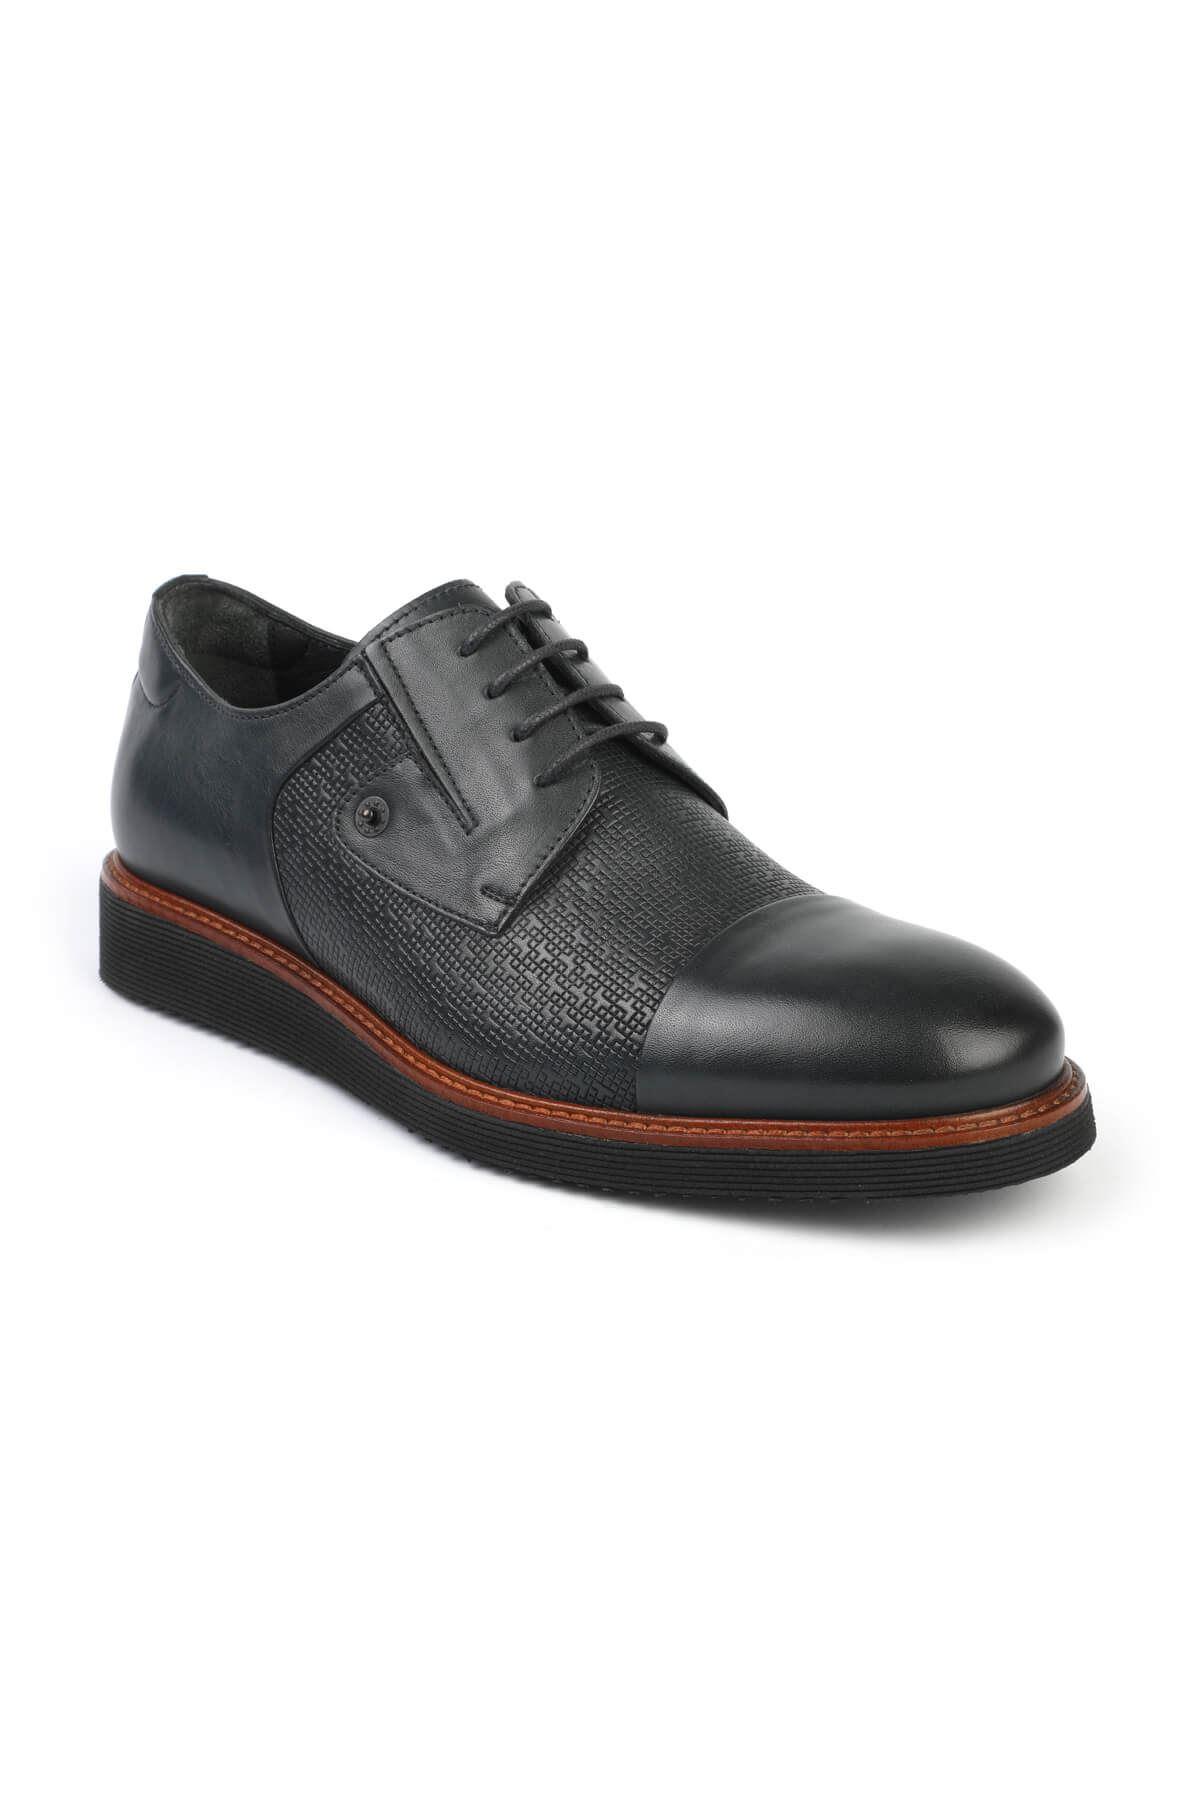 Libero C801 Lacivert Oxford Ayakkabı